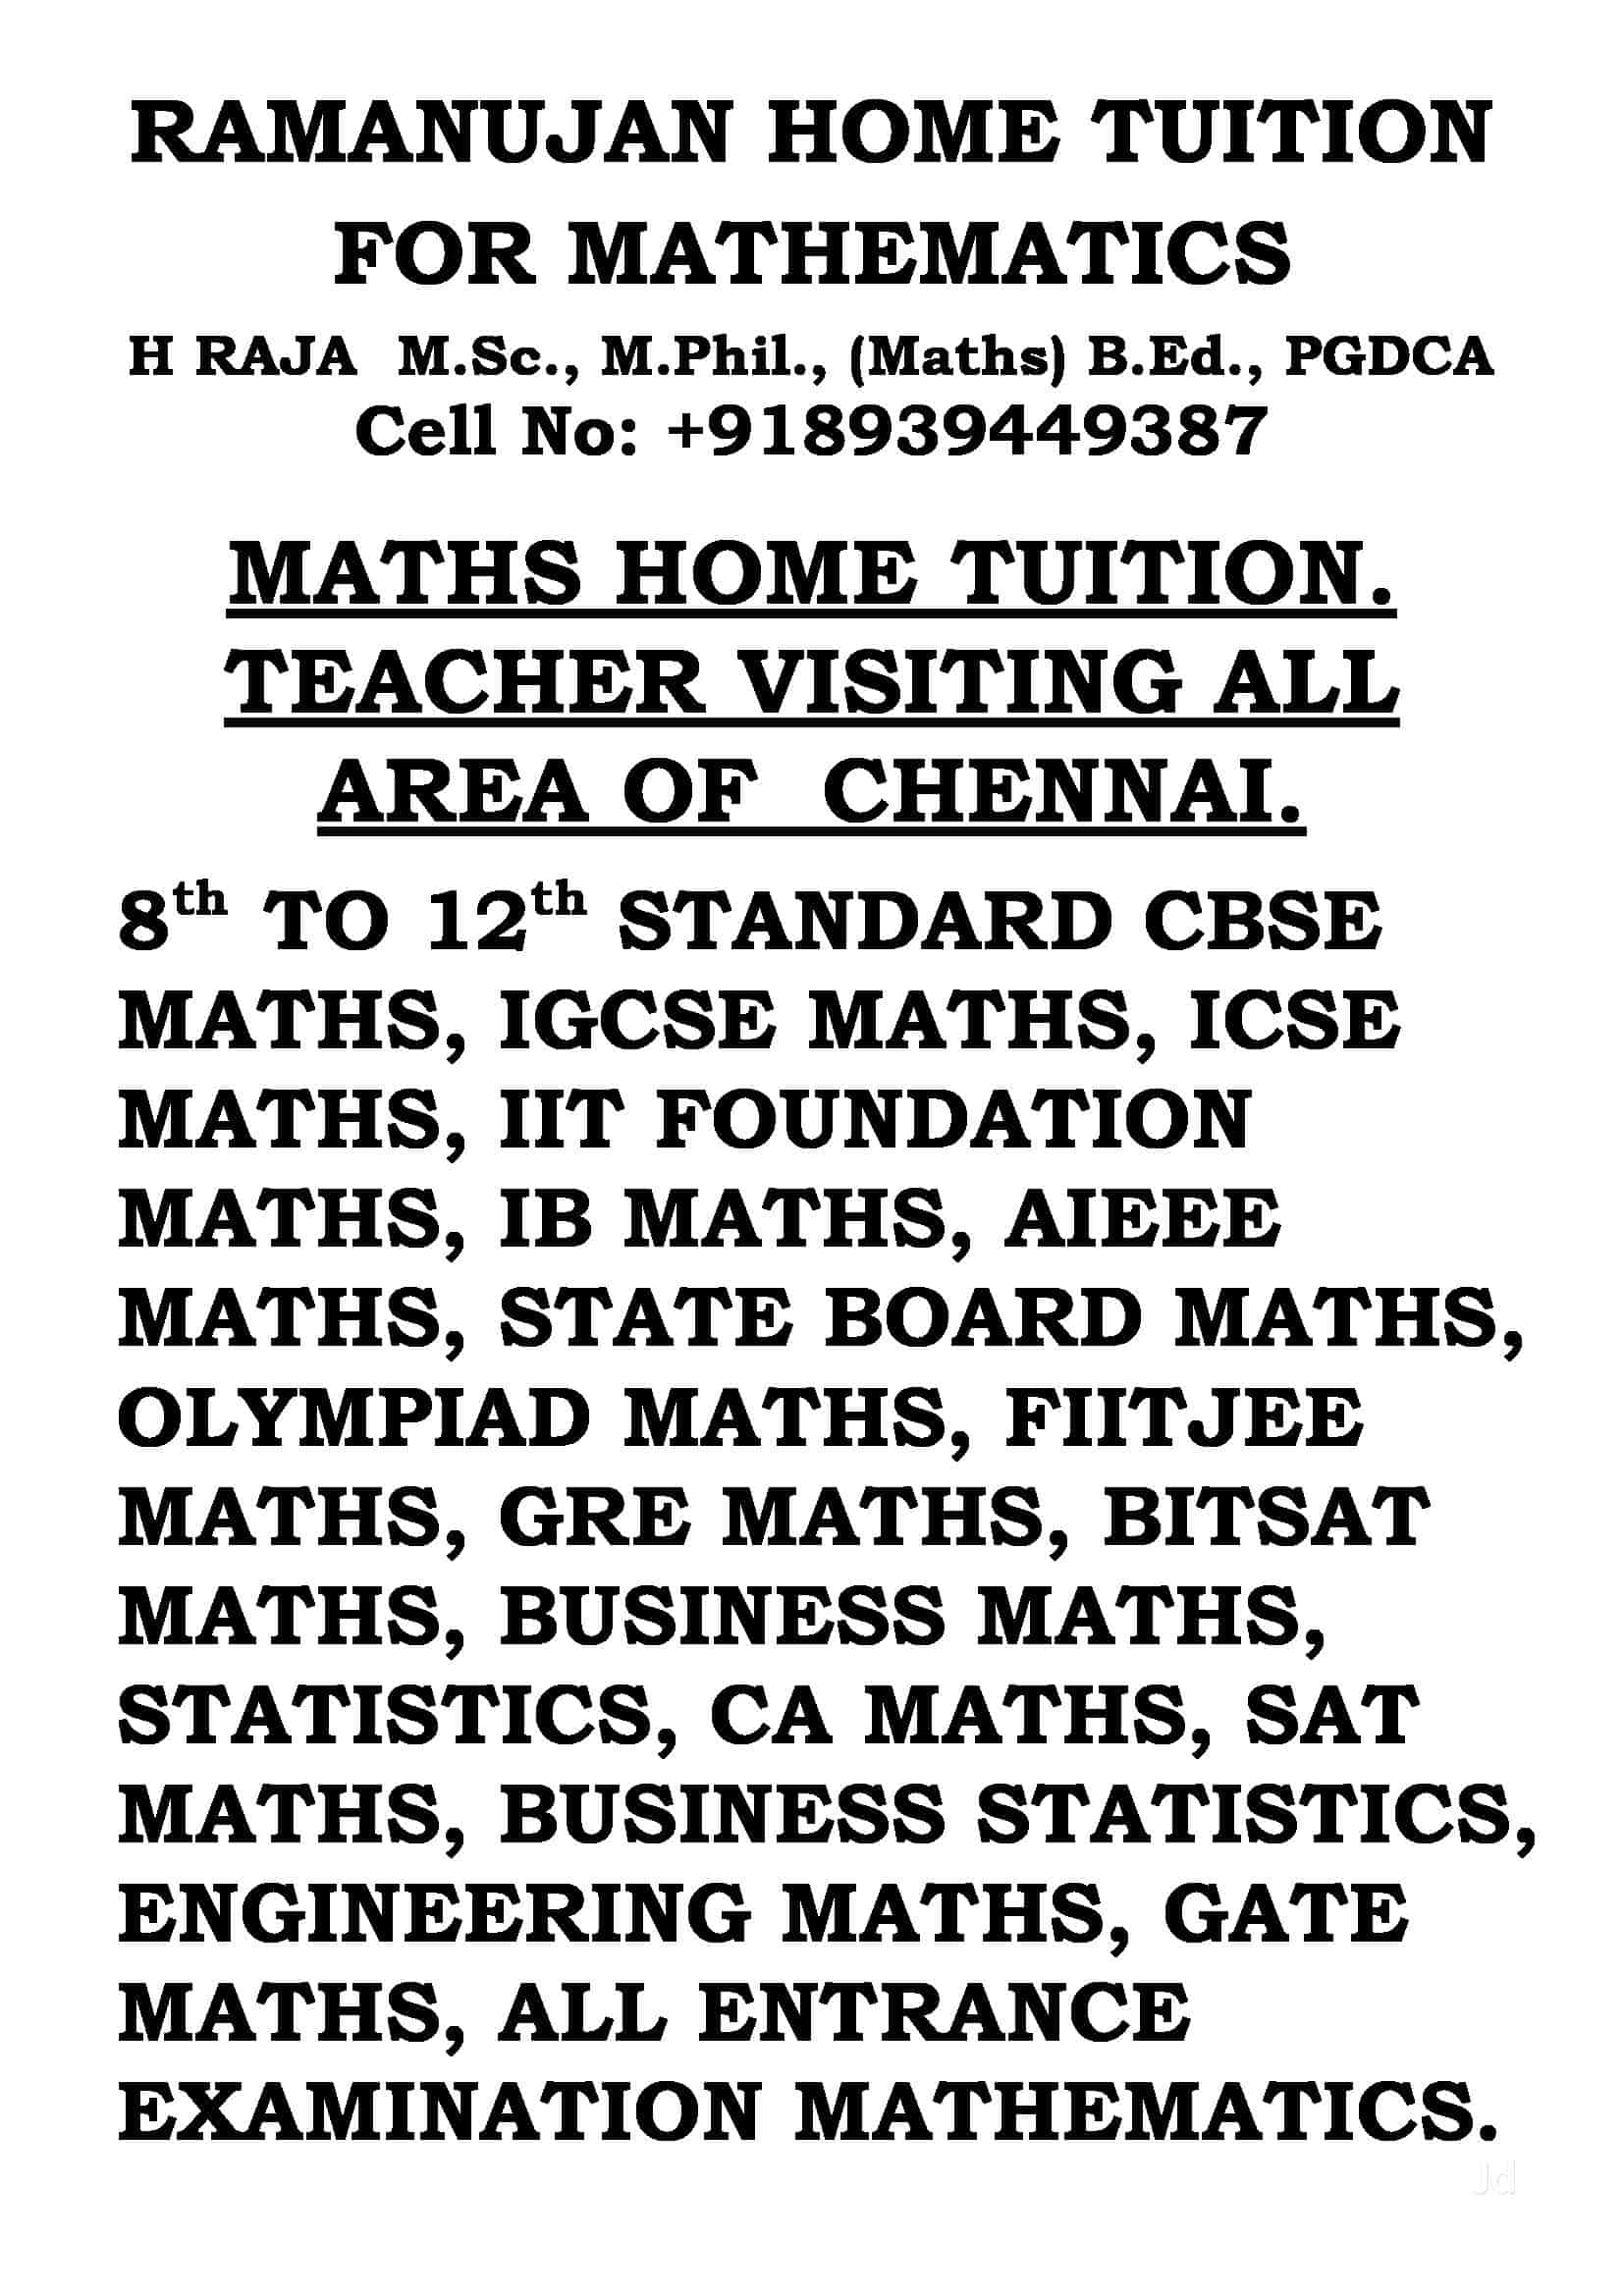 Ramanujan Home Tuition For Mathematics, Porur - Tutorials